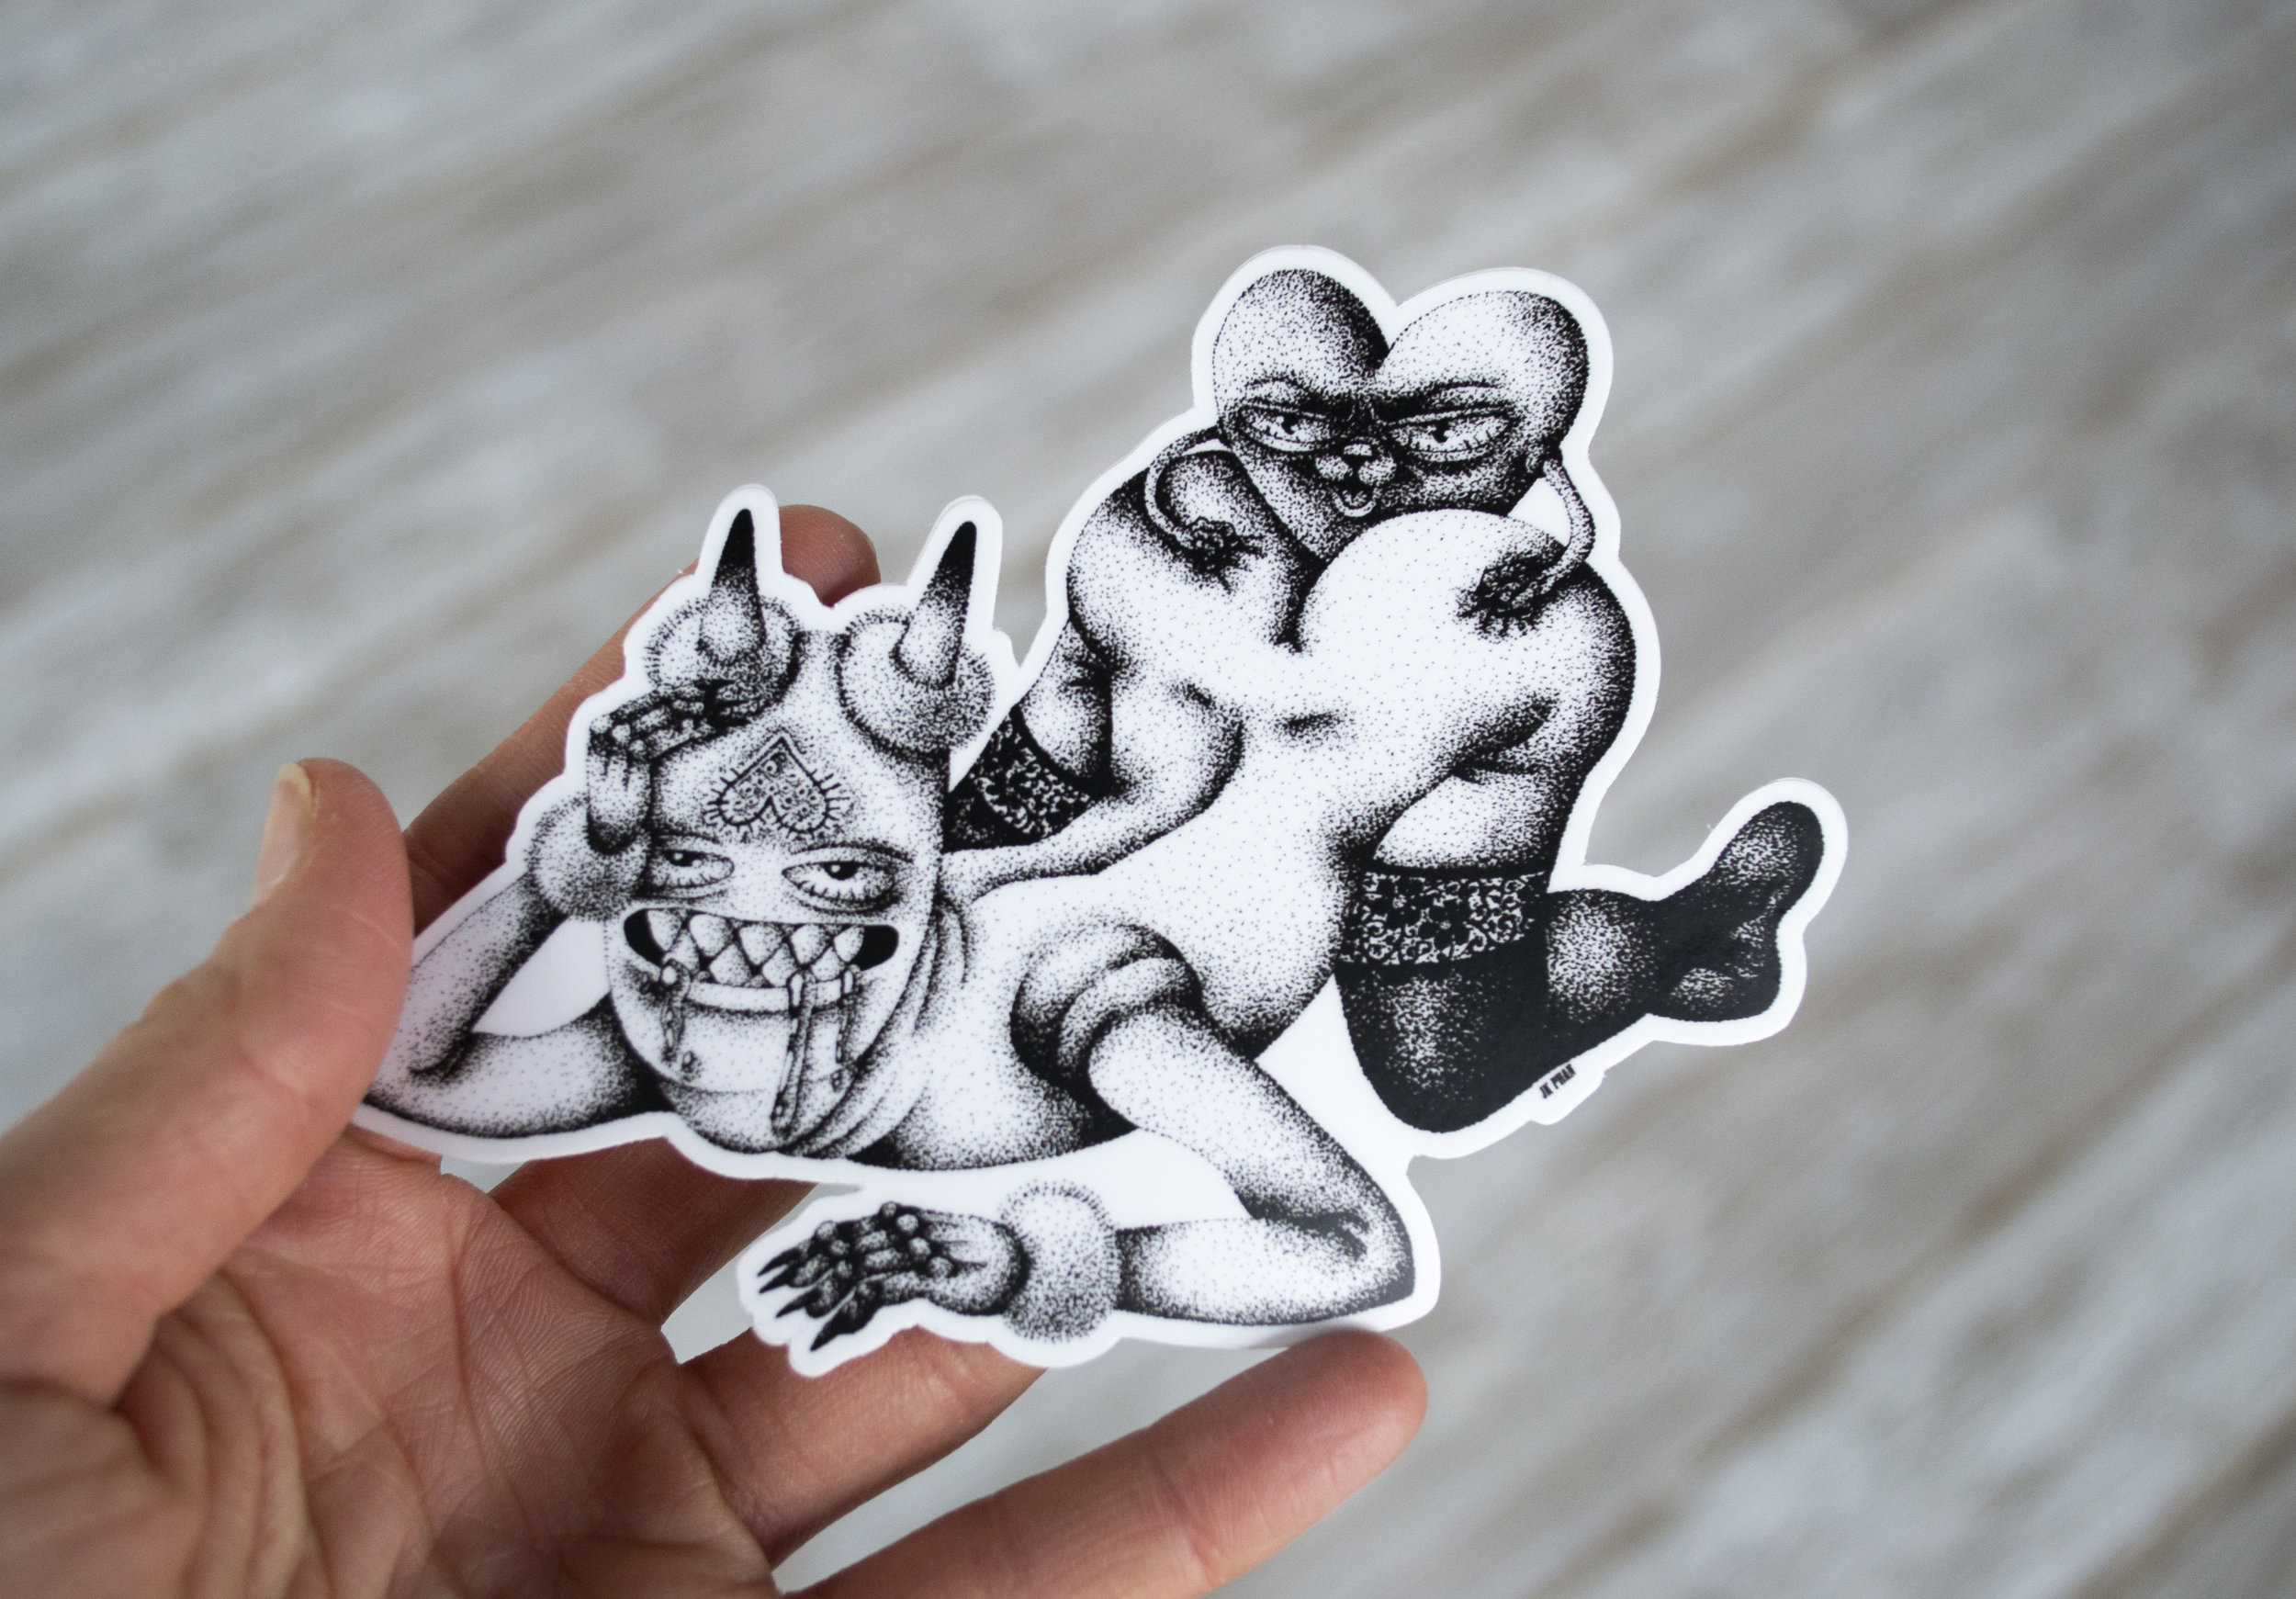 Buttsex Sticker